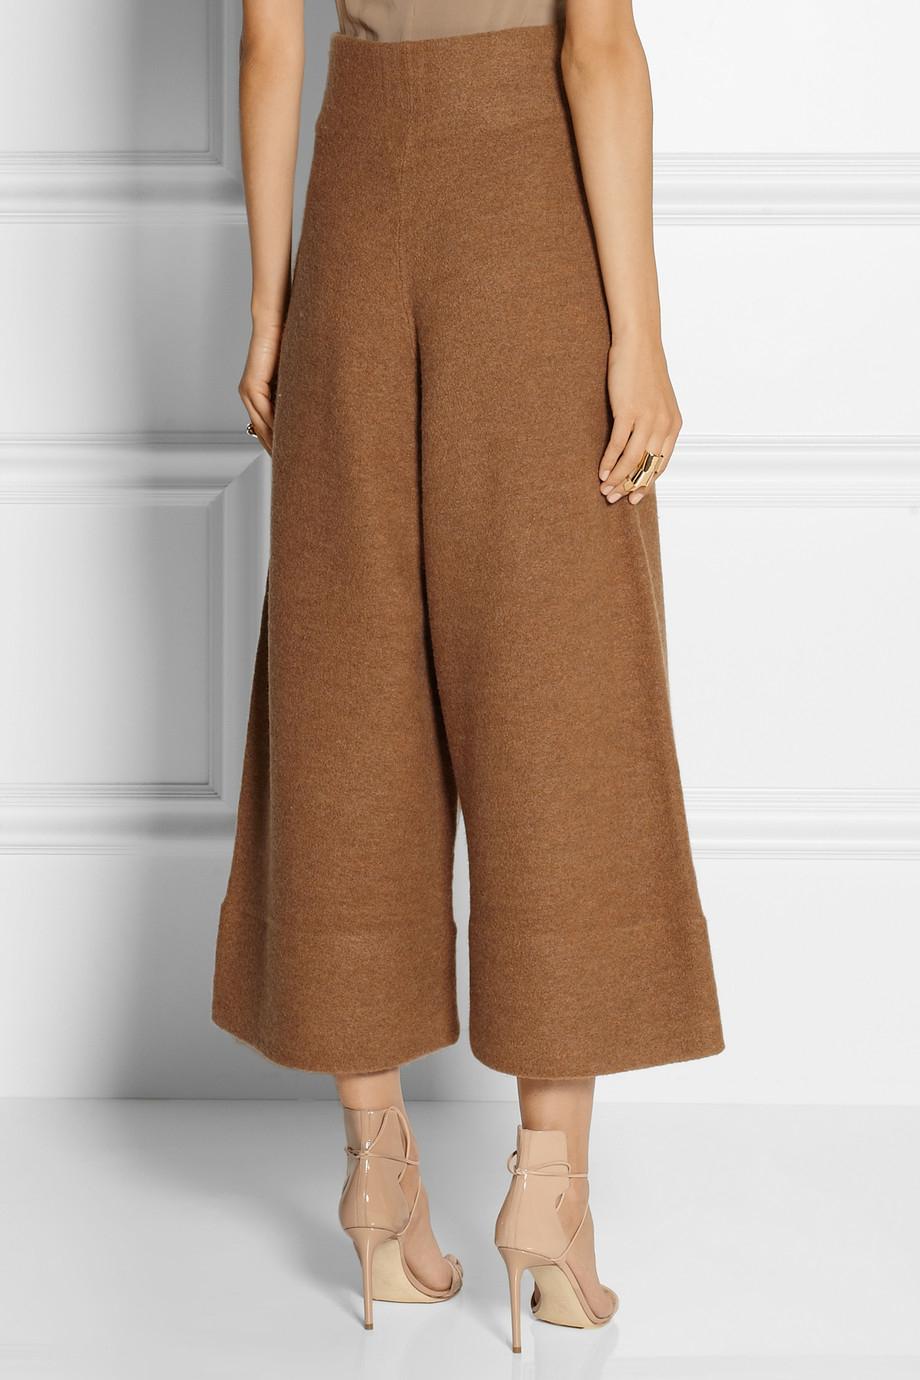 Acne studios Depend Cropped Boiled Wool Wide-Leg Pants in Brown | Lyst